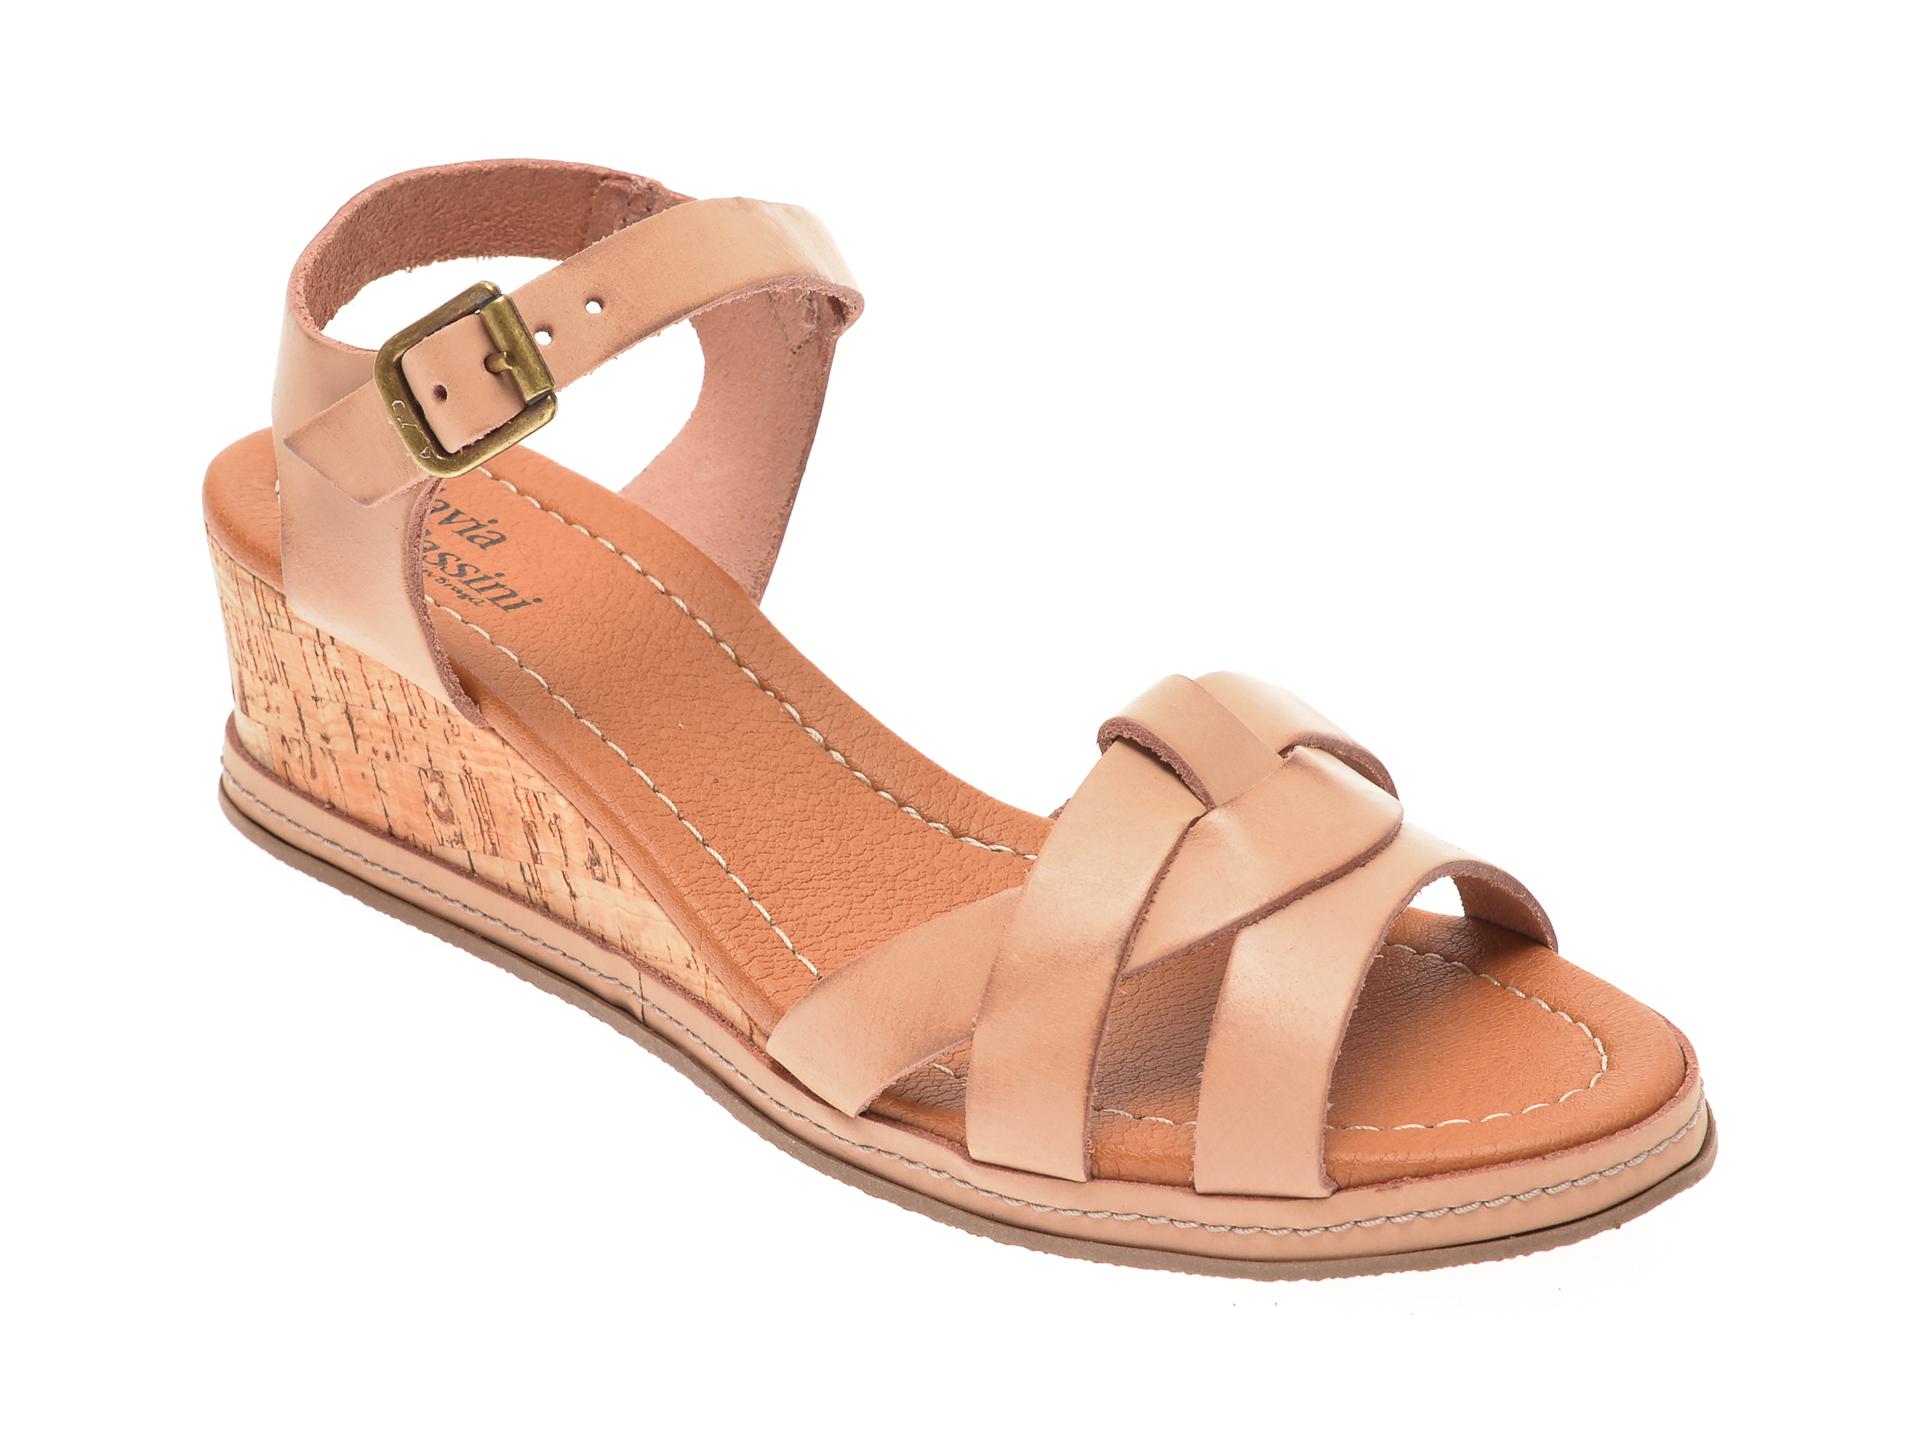 Sandale FLAVIA PASSINI nude, 22001, din piele naturala